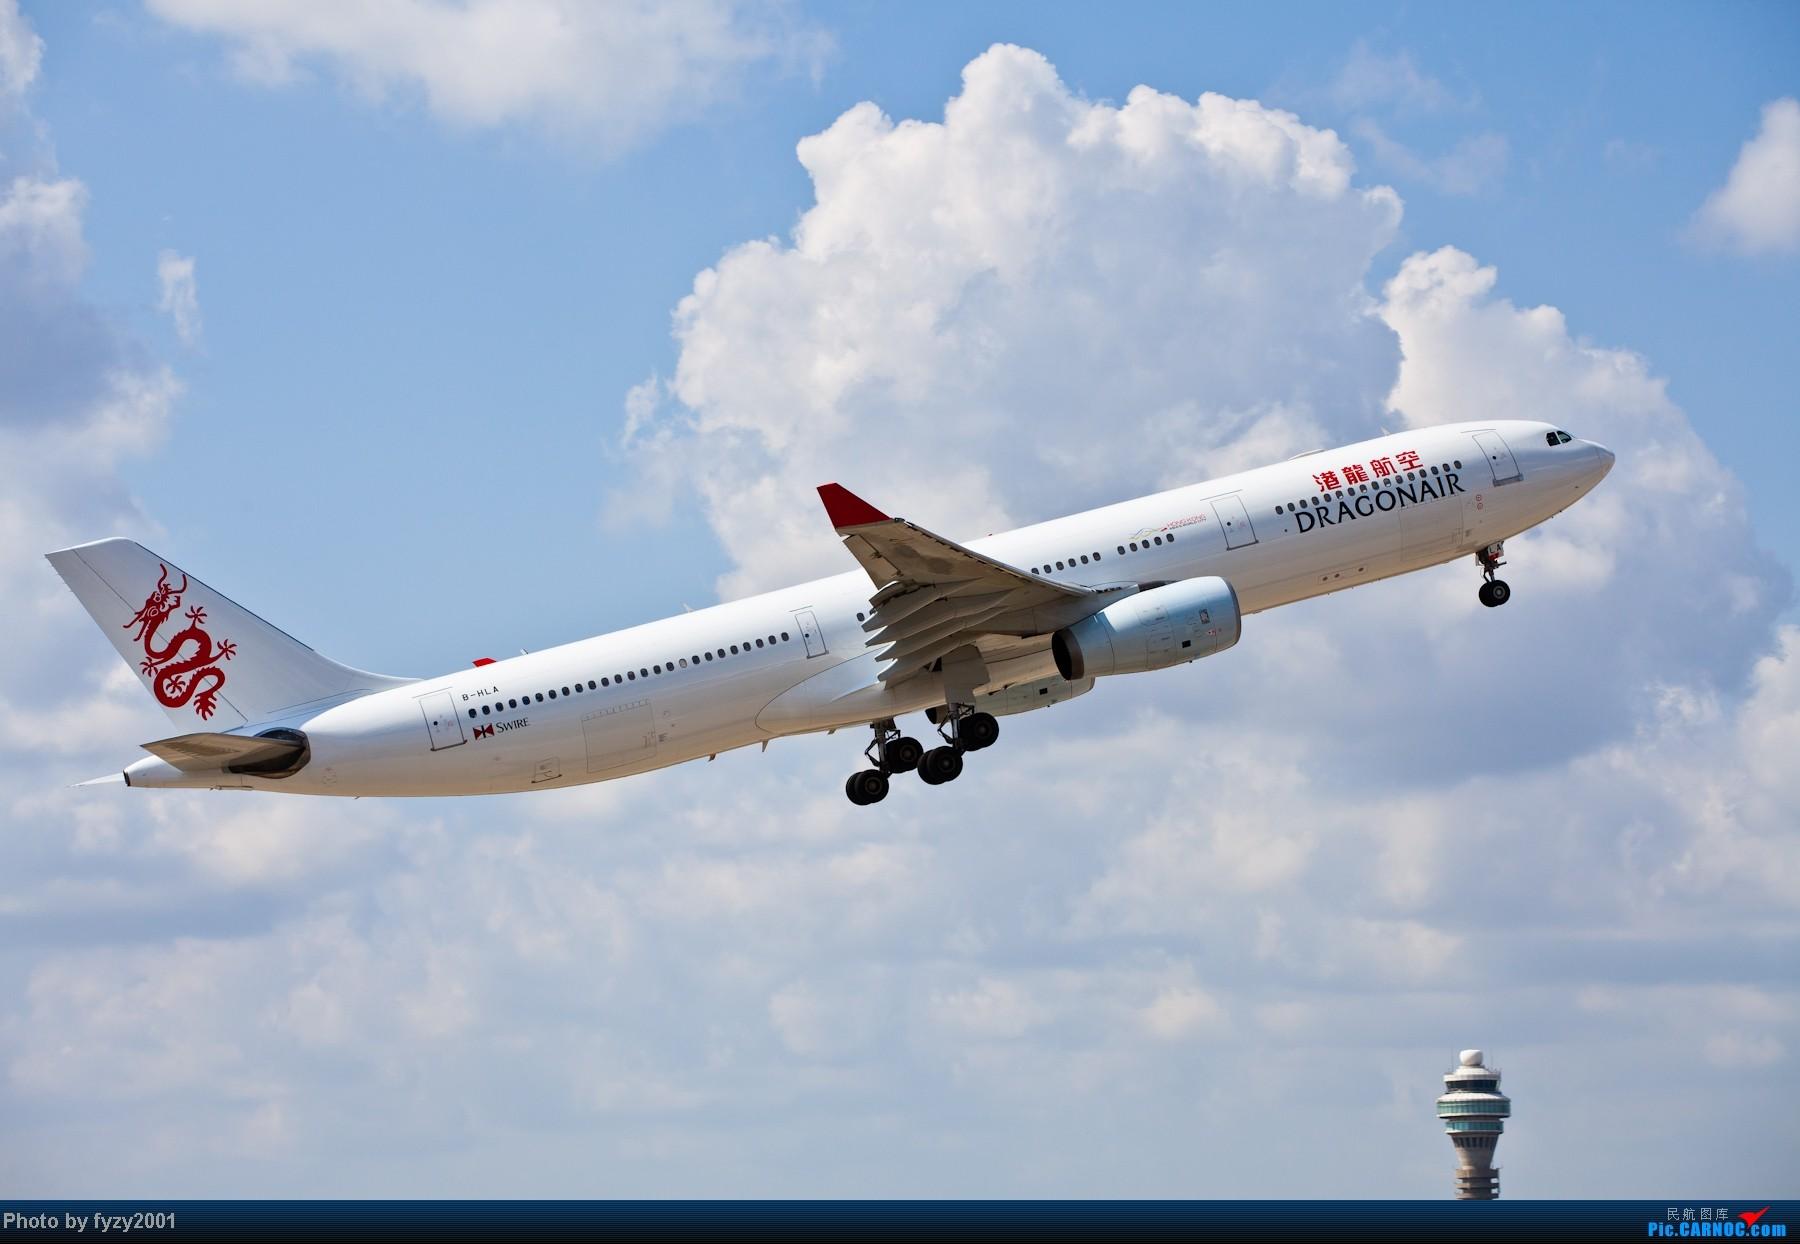 Re:[原创][无锡西站]长假PVG蹲守~~~~只发大图,多图杀猫~~~~ AIRBUS A330-300 B-HLA 中国上海浦东机场